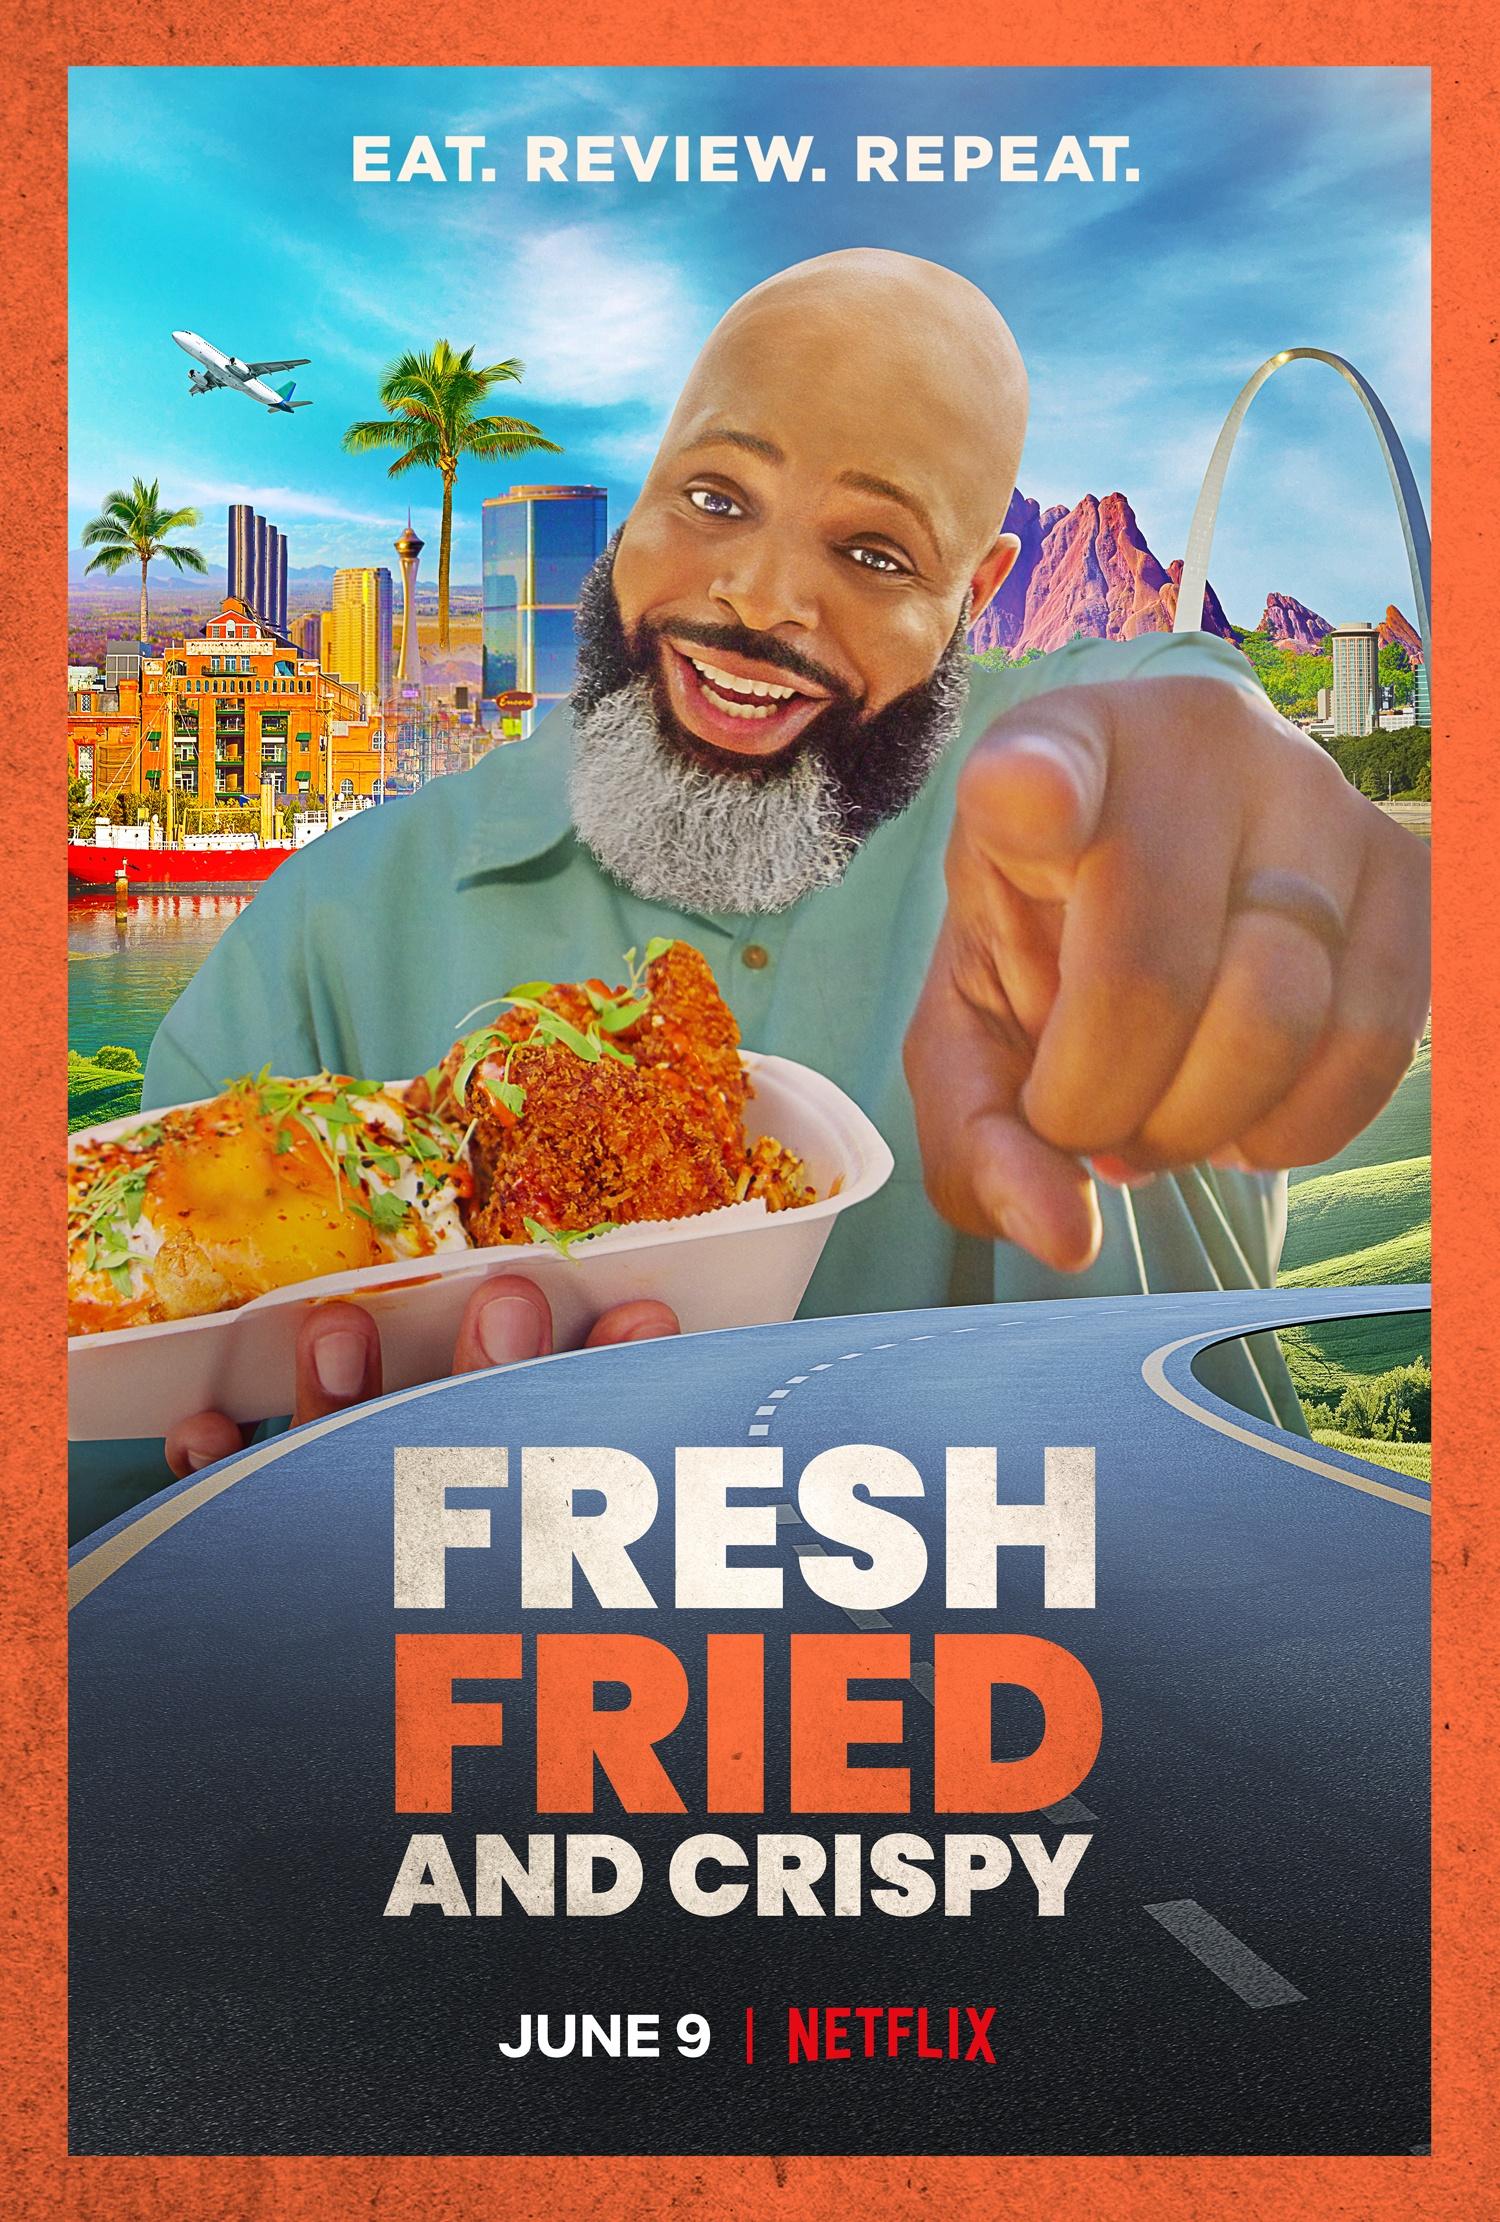 Netflix Series: Fresh Fried & Crispy Starring Daym Drops